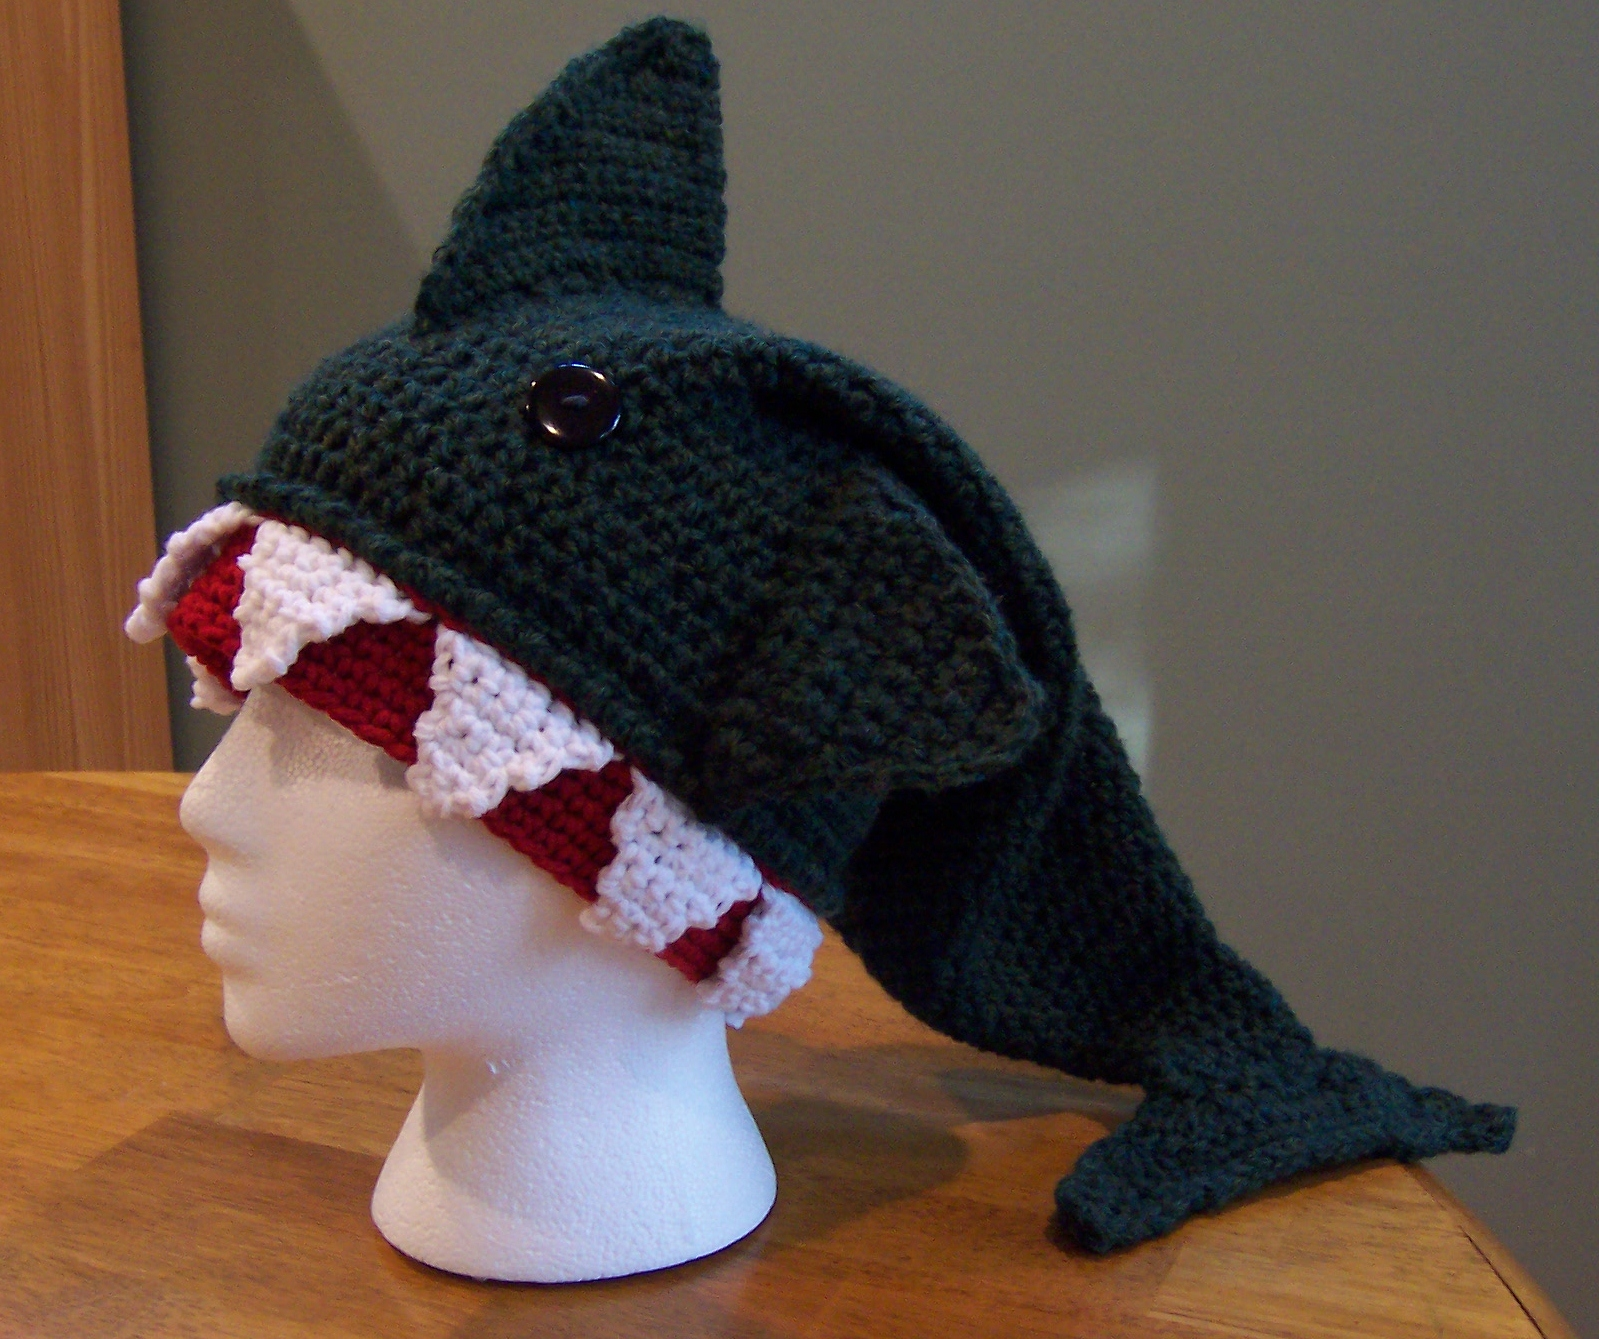 Crochet Patterns Crochet By Darleen Hopkins